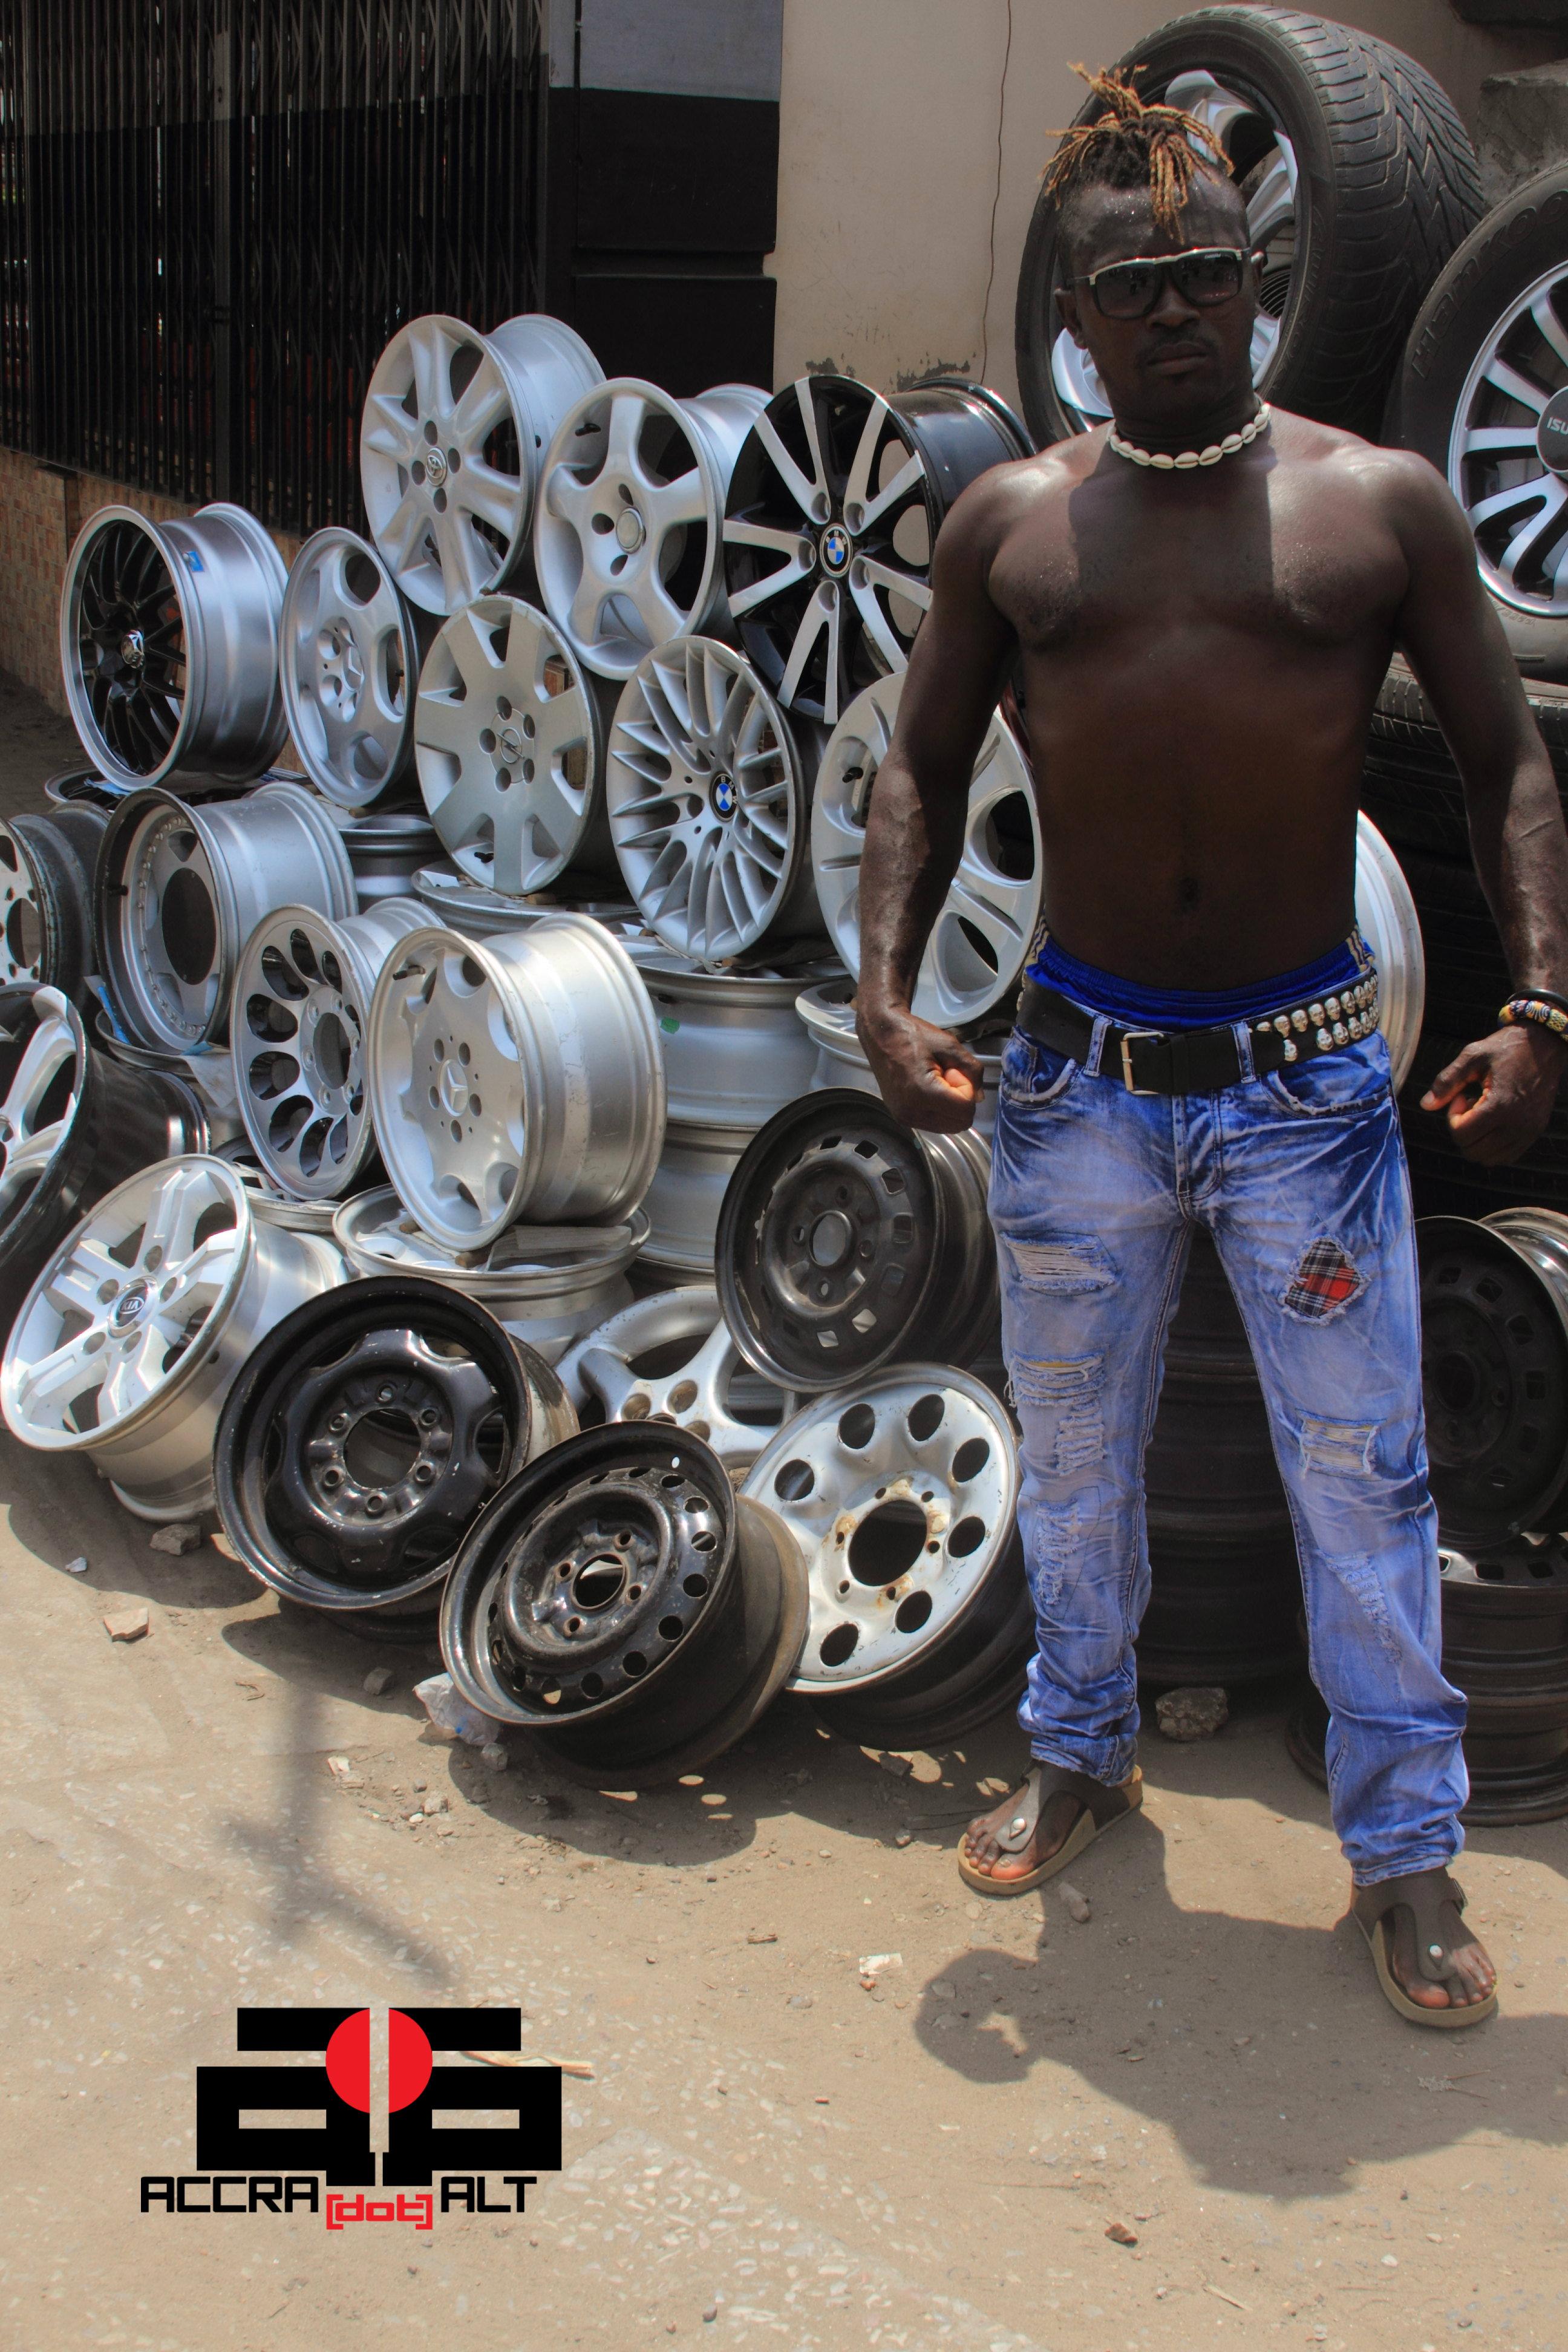 Iron Gang 2a - photo by ACCRA [dot] ALT